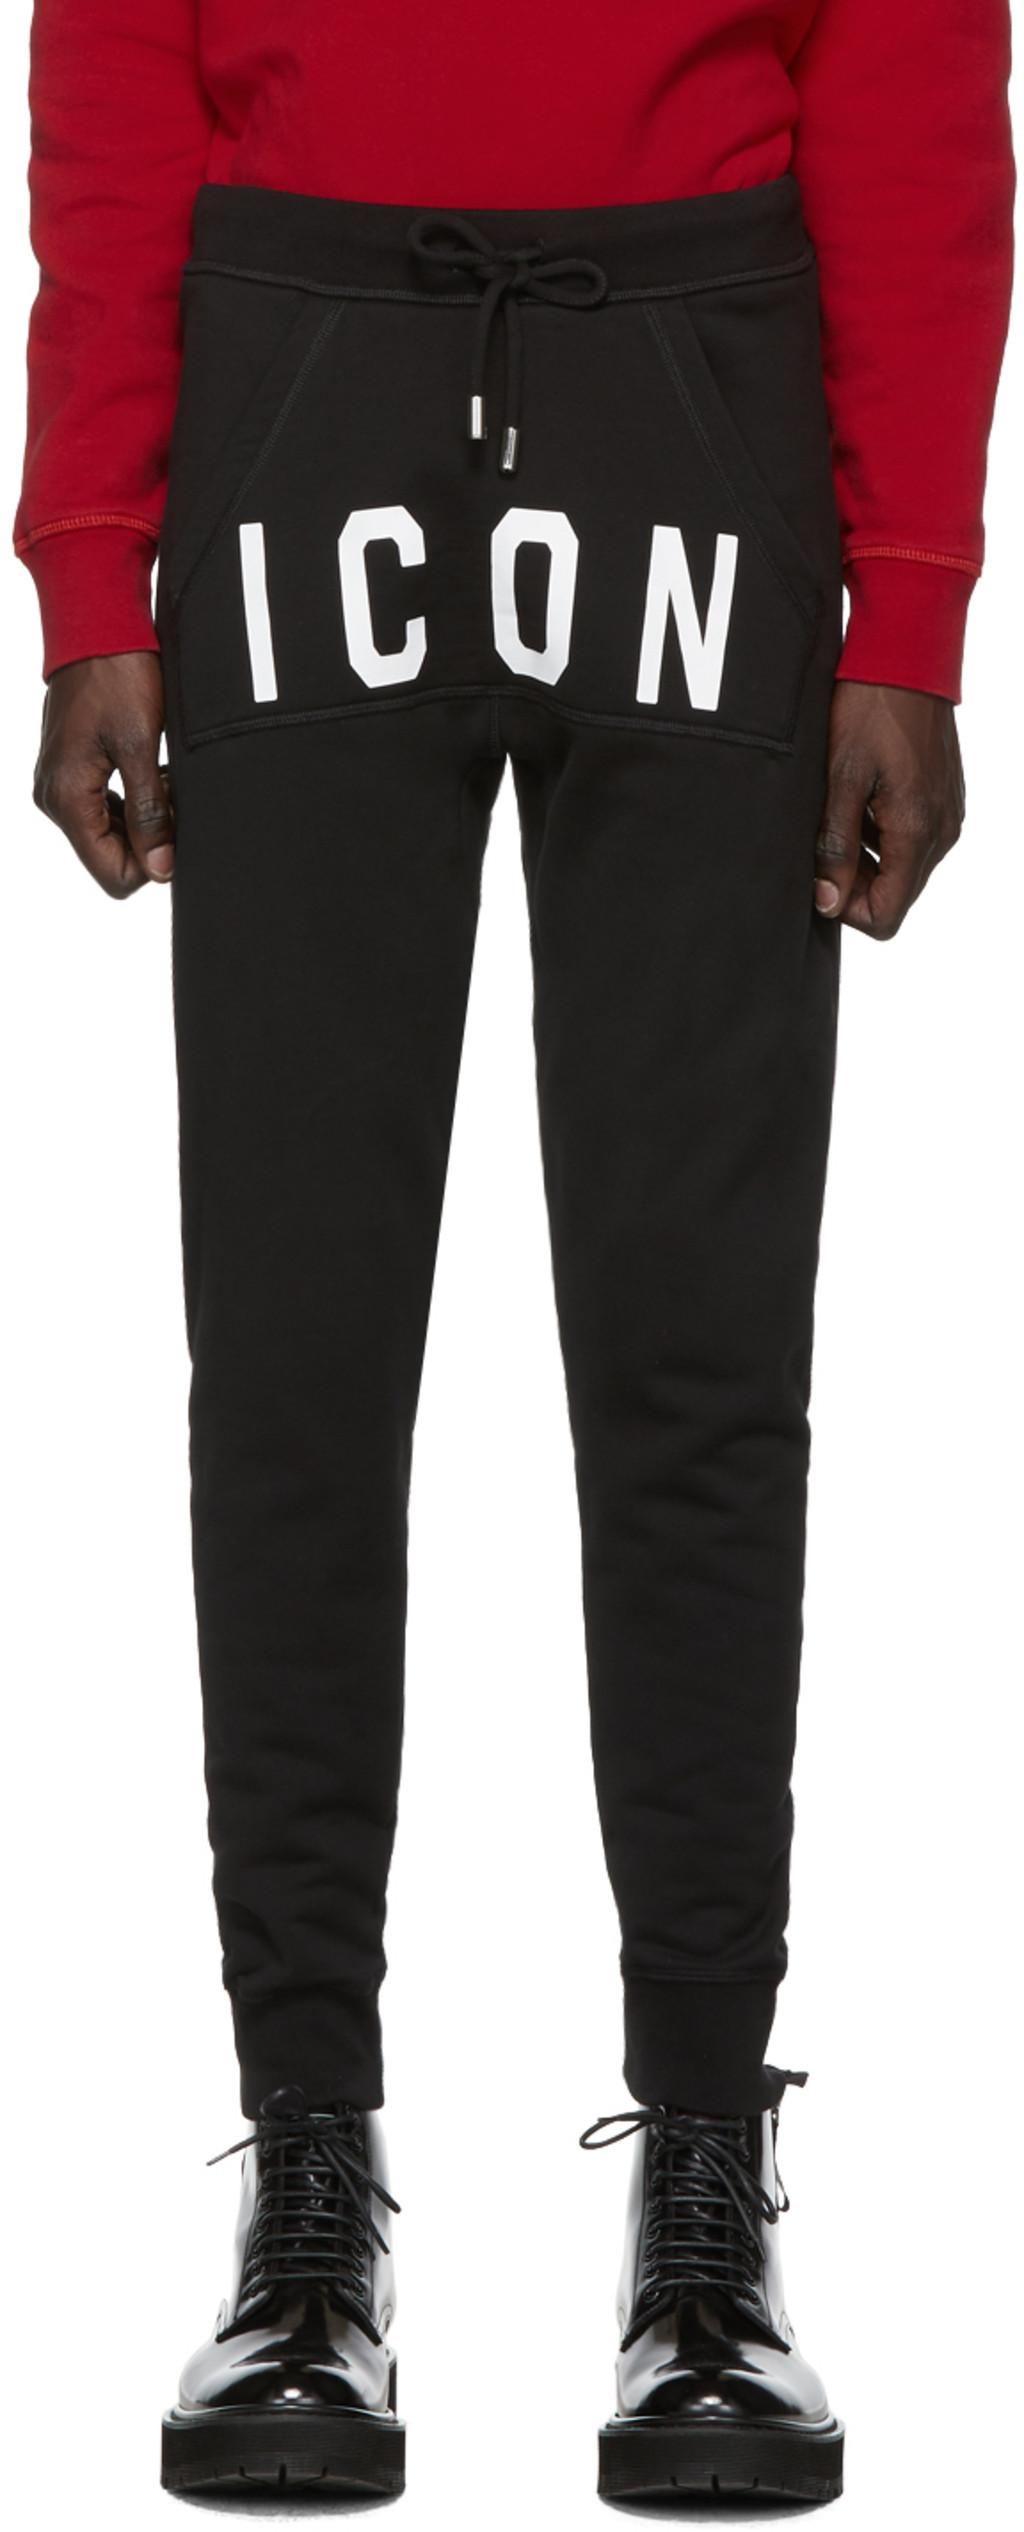 'icono' de negro Pantalones Pantalones chándal rWdBoeCx